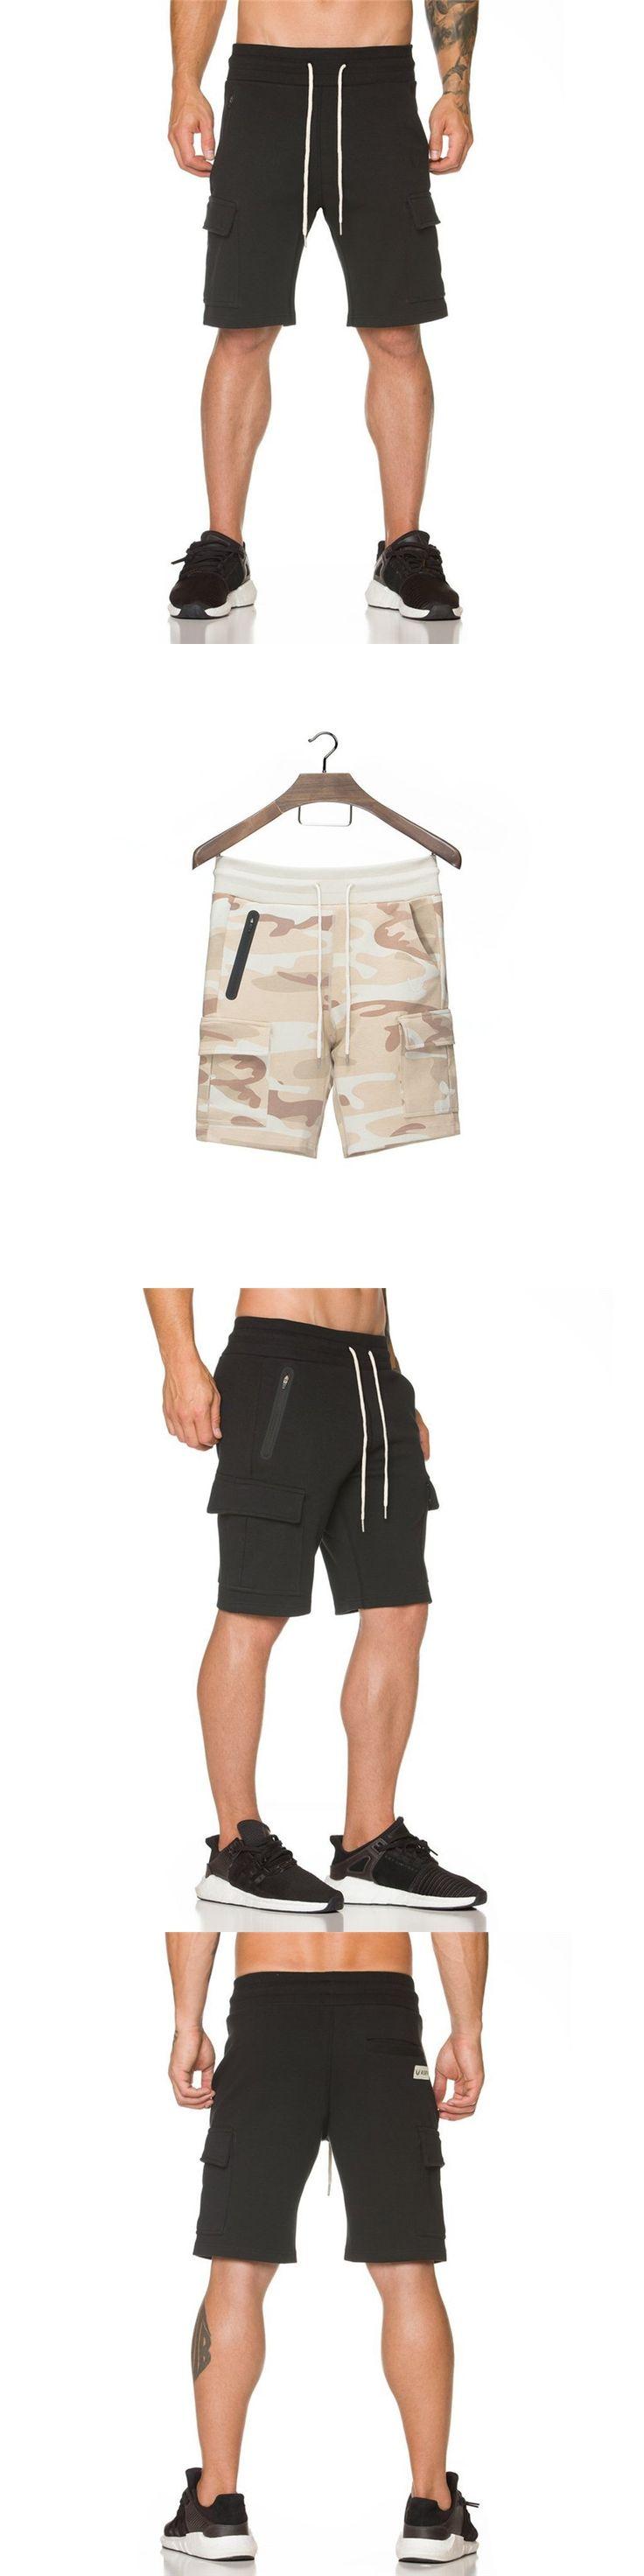 New Fashion Men Sporting Shorts Trousers Cotton Bodybuilding Sweatpants Fitness Short Jogger Casual Gyms Men Shorts